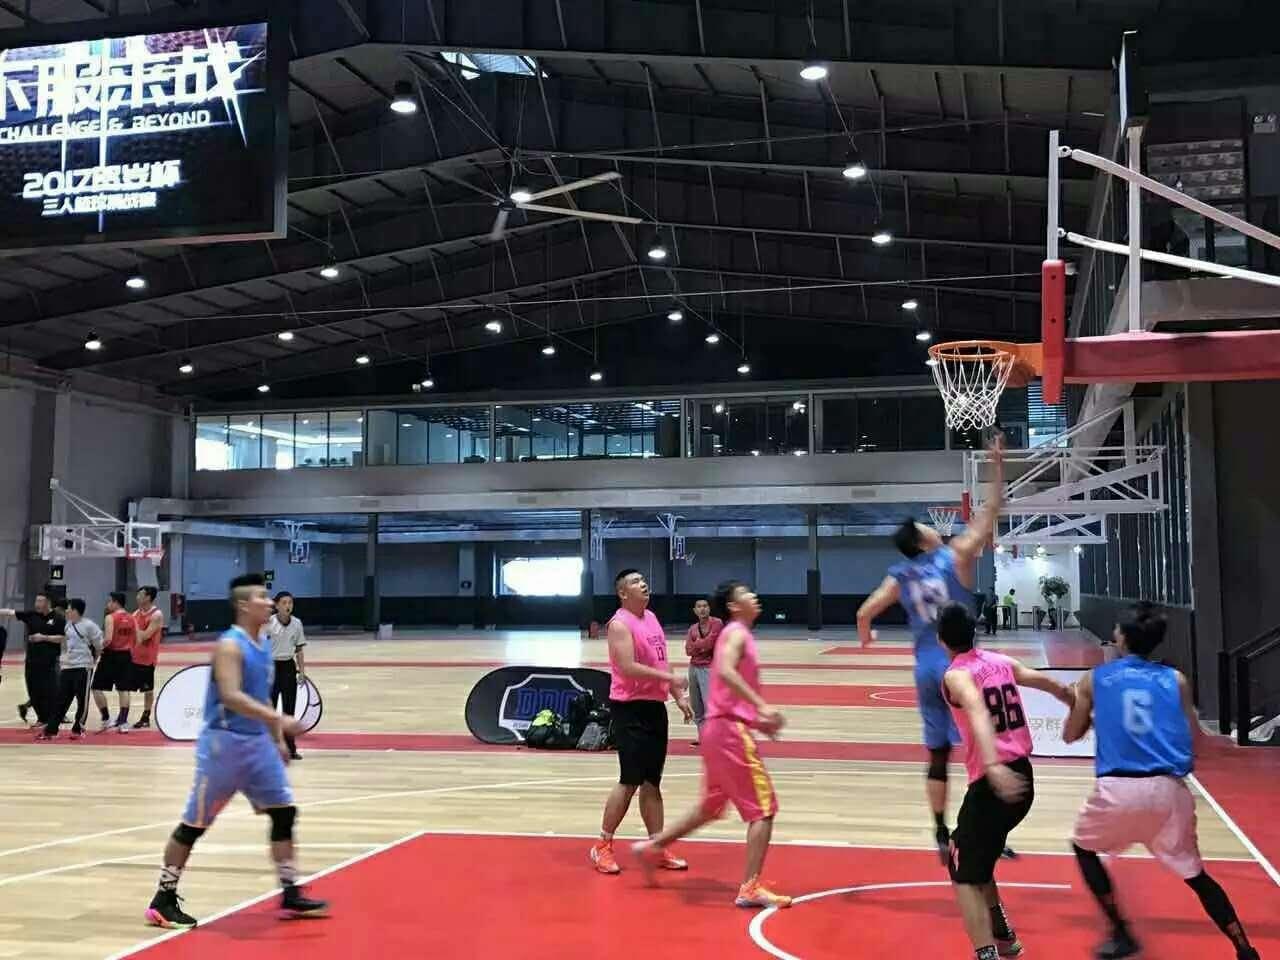 Indoor Sports Center Ceiling Fans Amp Gym Ceiling Fans